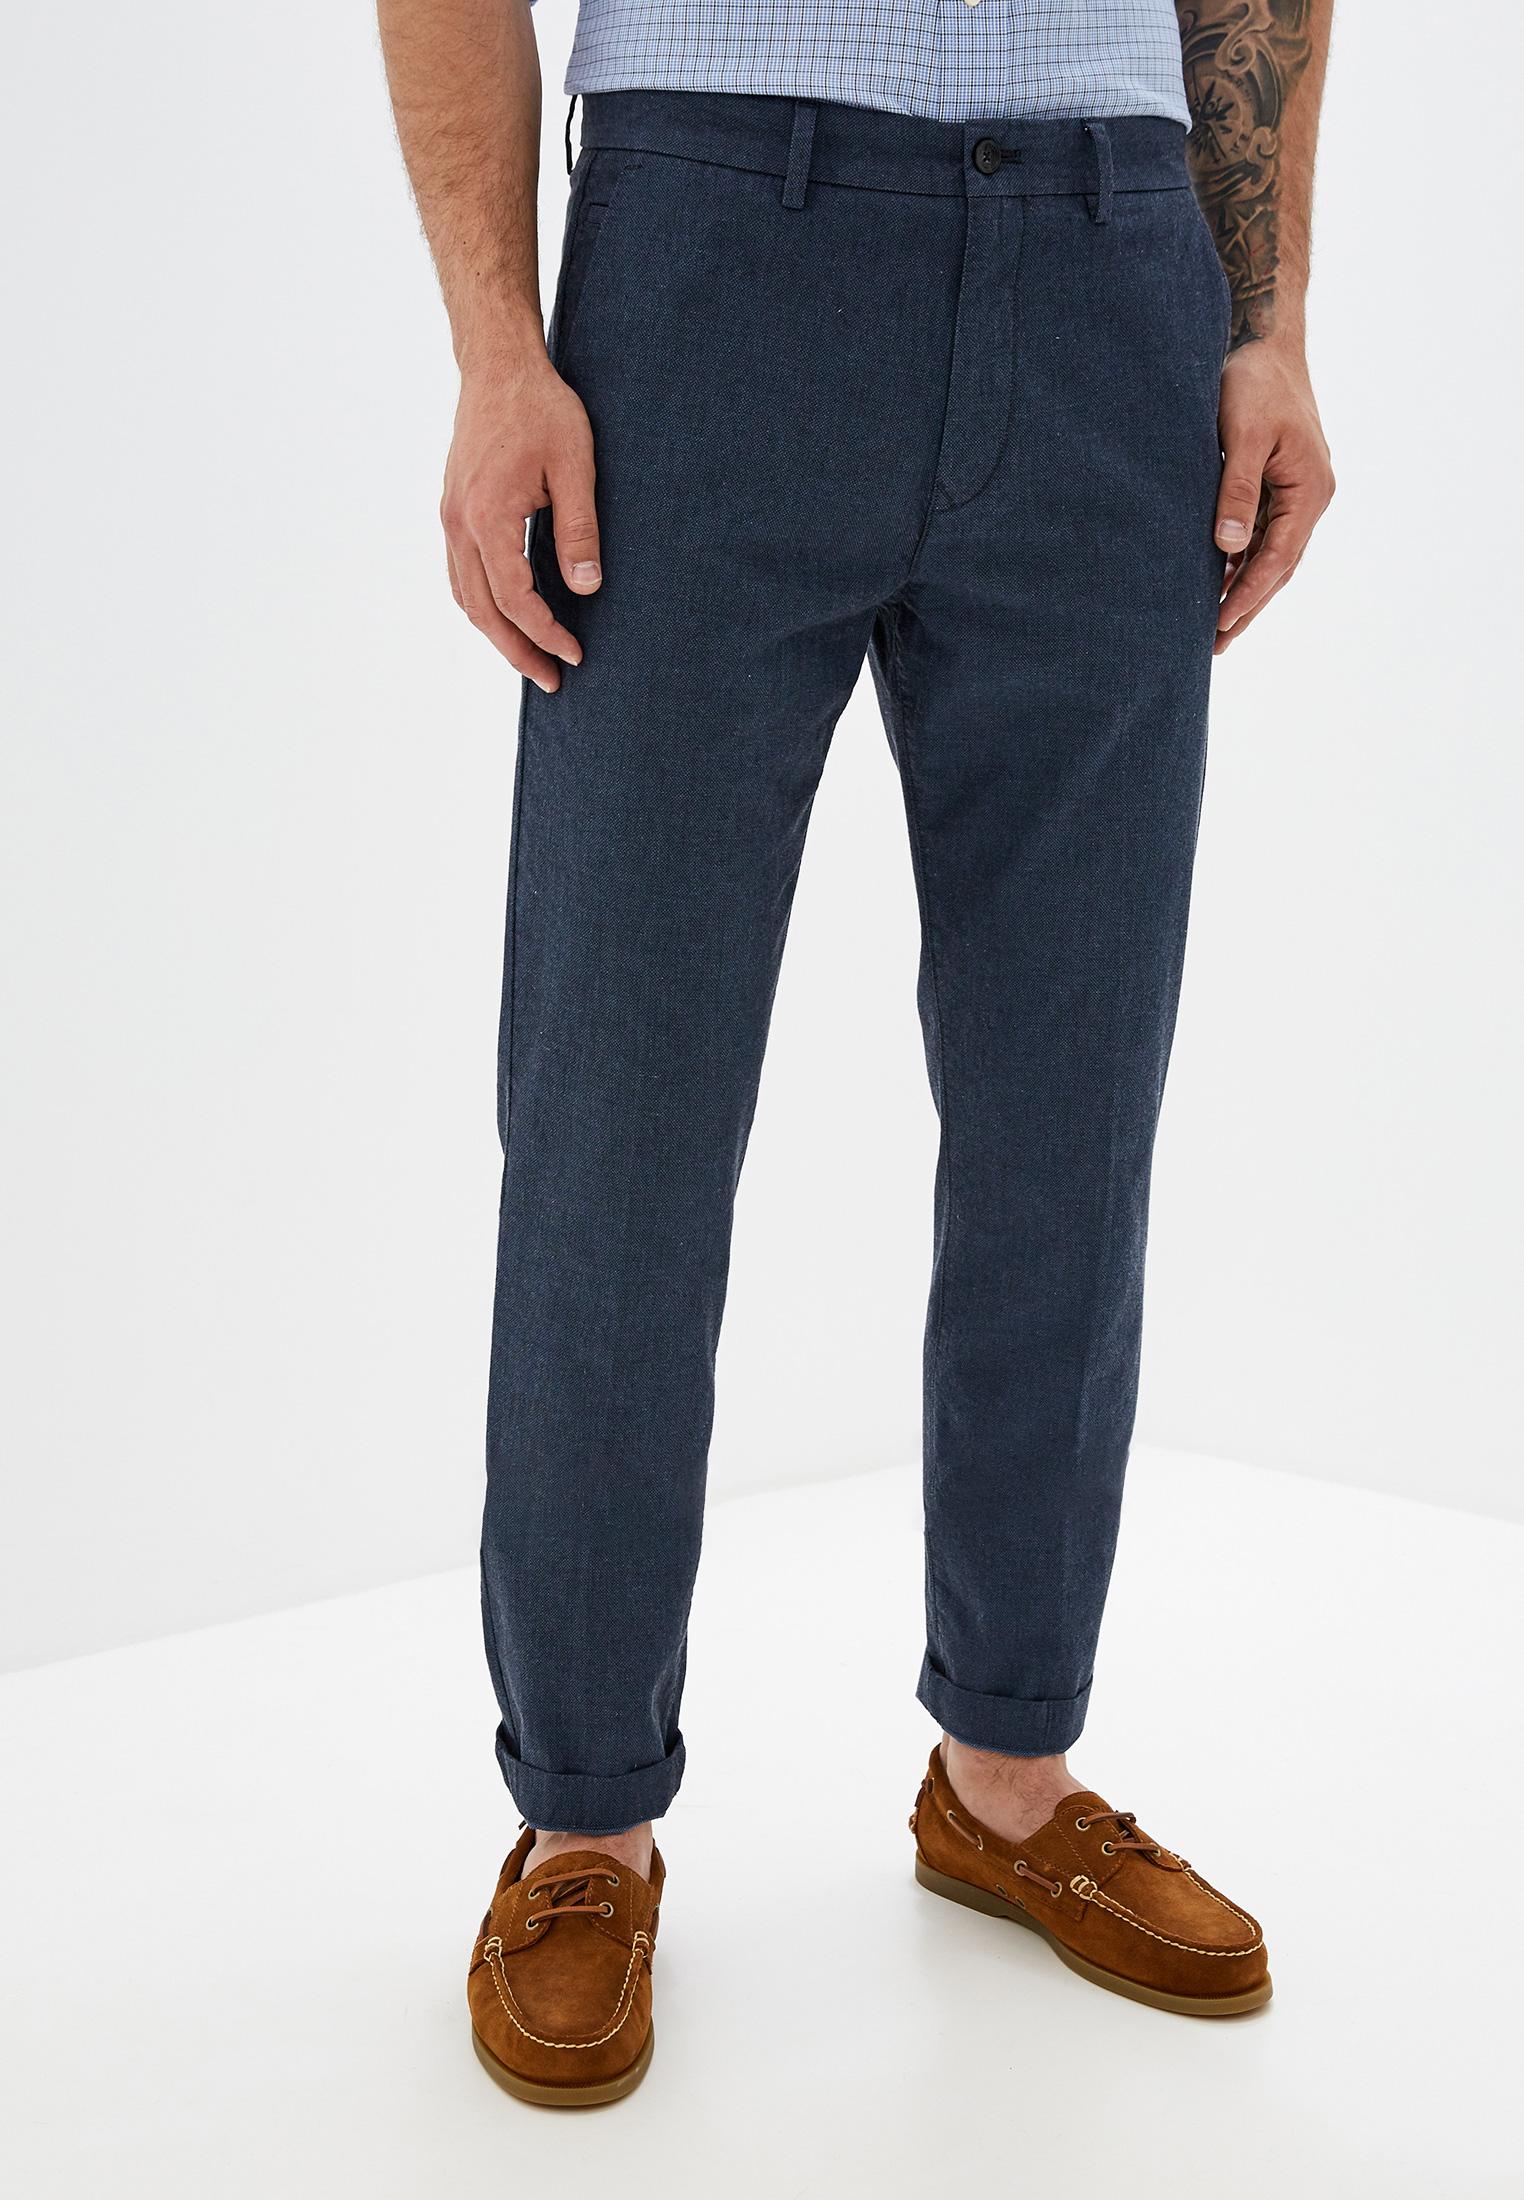 Мужские брюки Calvin Klein (Кельвин Кляйн) k10k104030